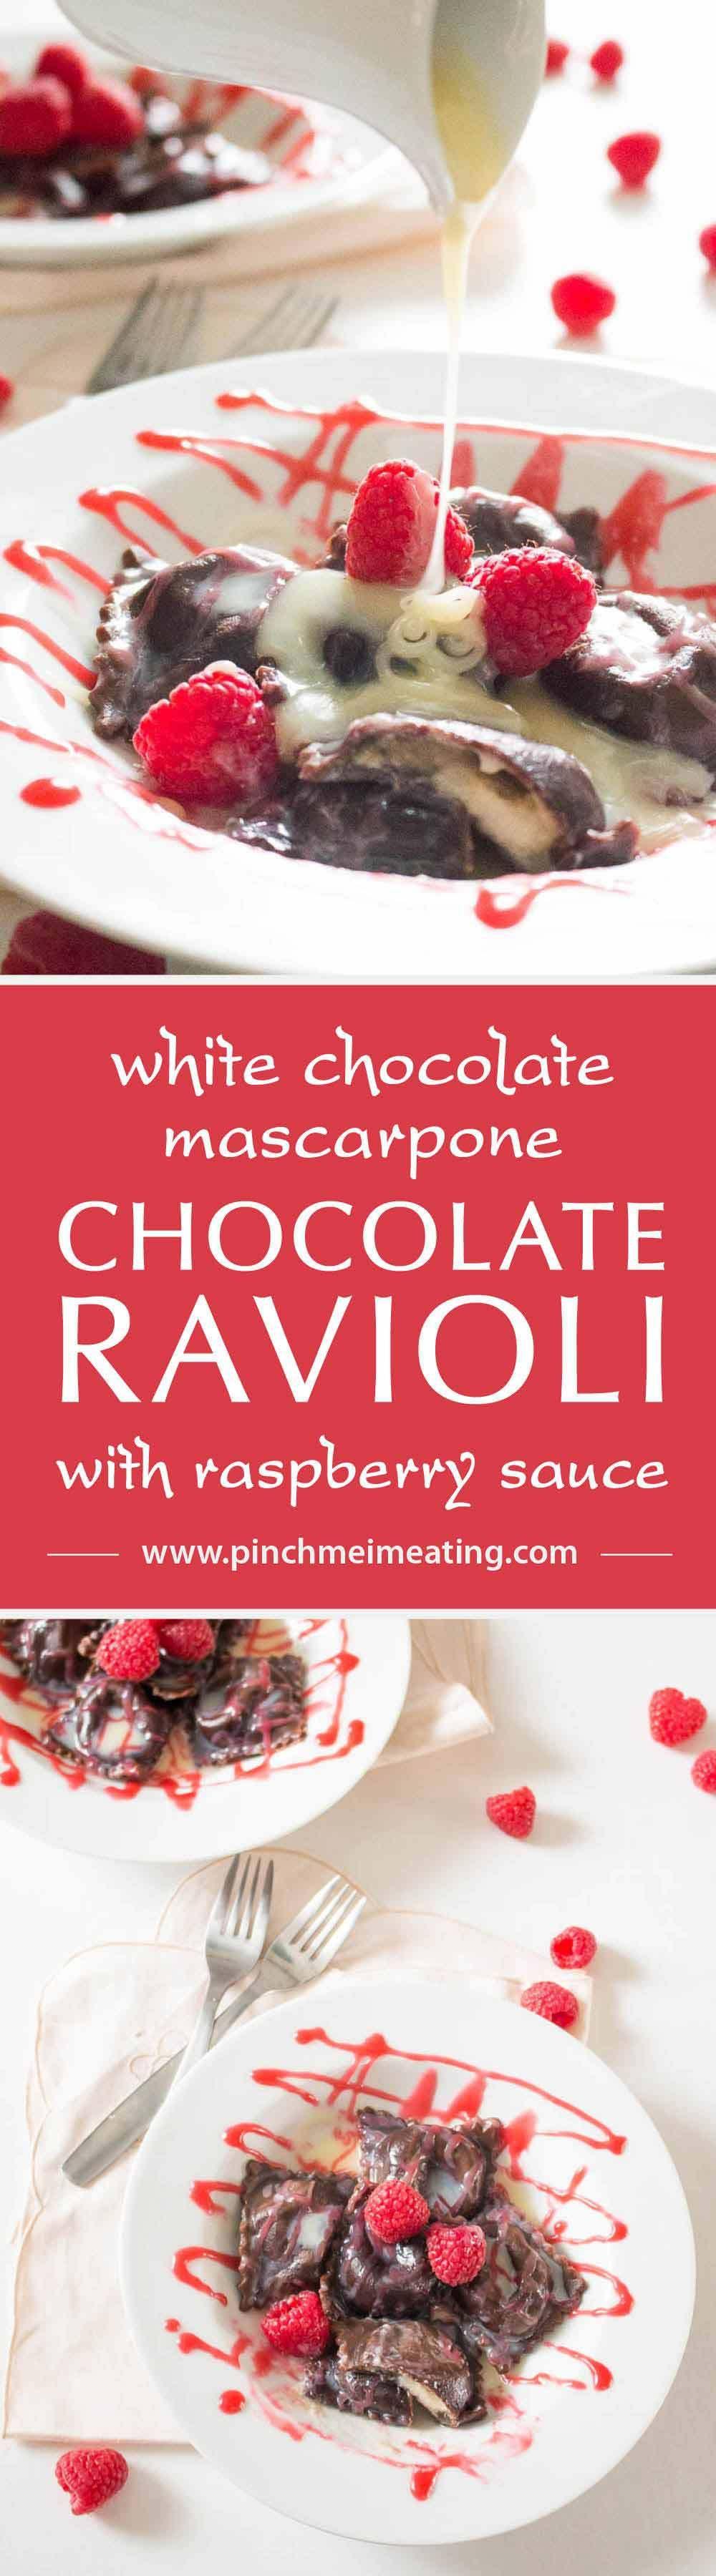 Chocolate Ravioli with White Chocolate Mascarpone and Raspberry Sauce